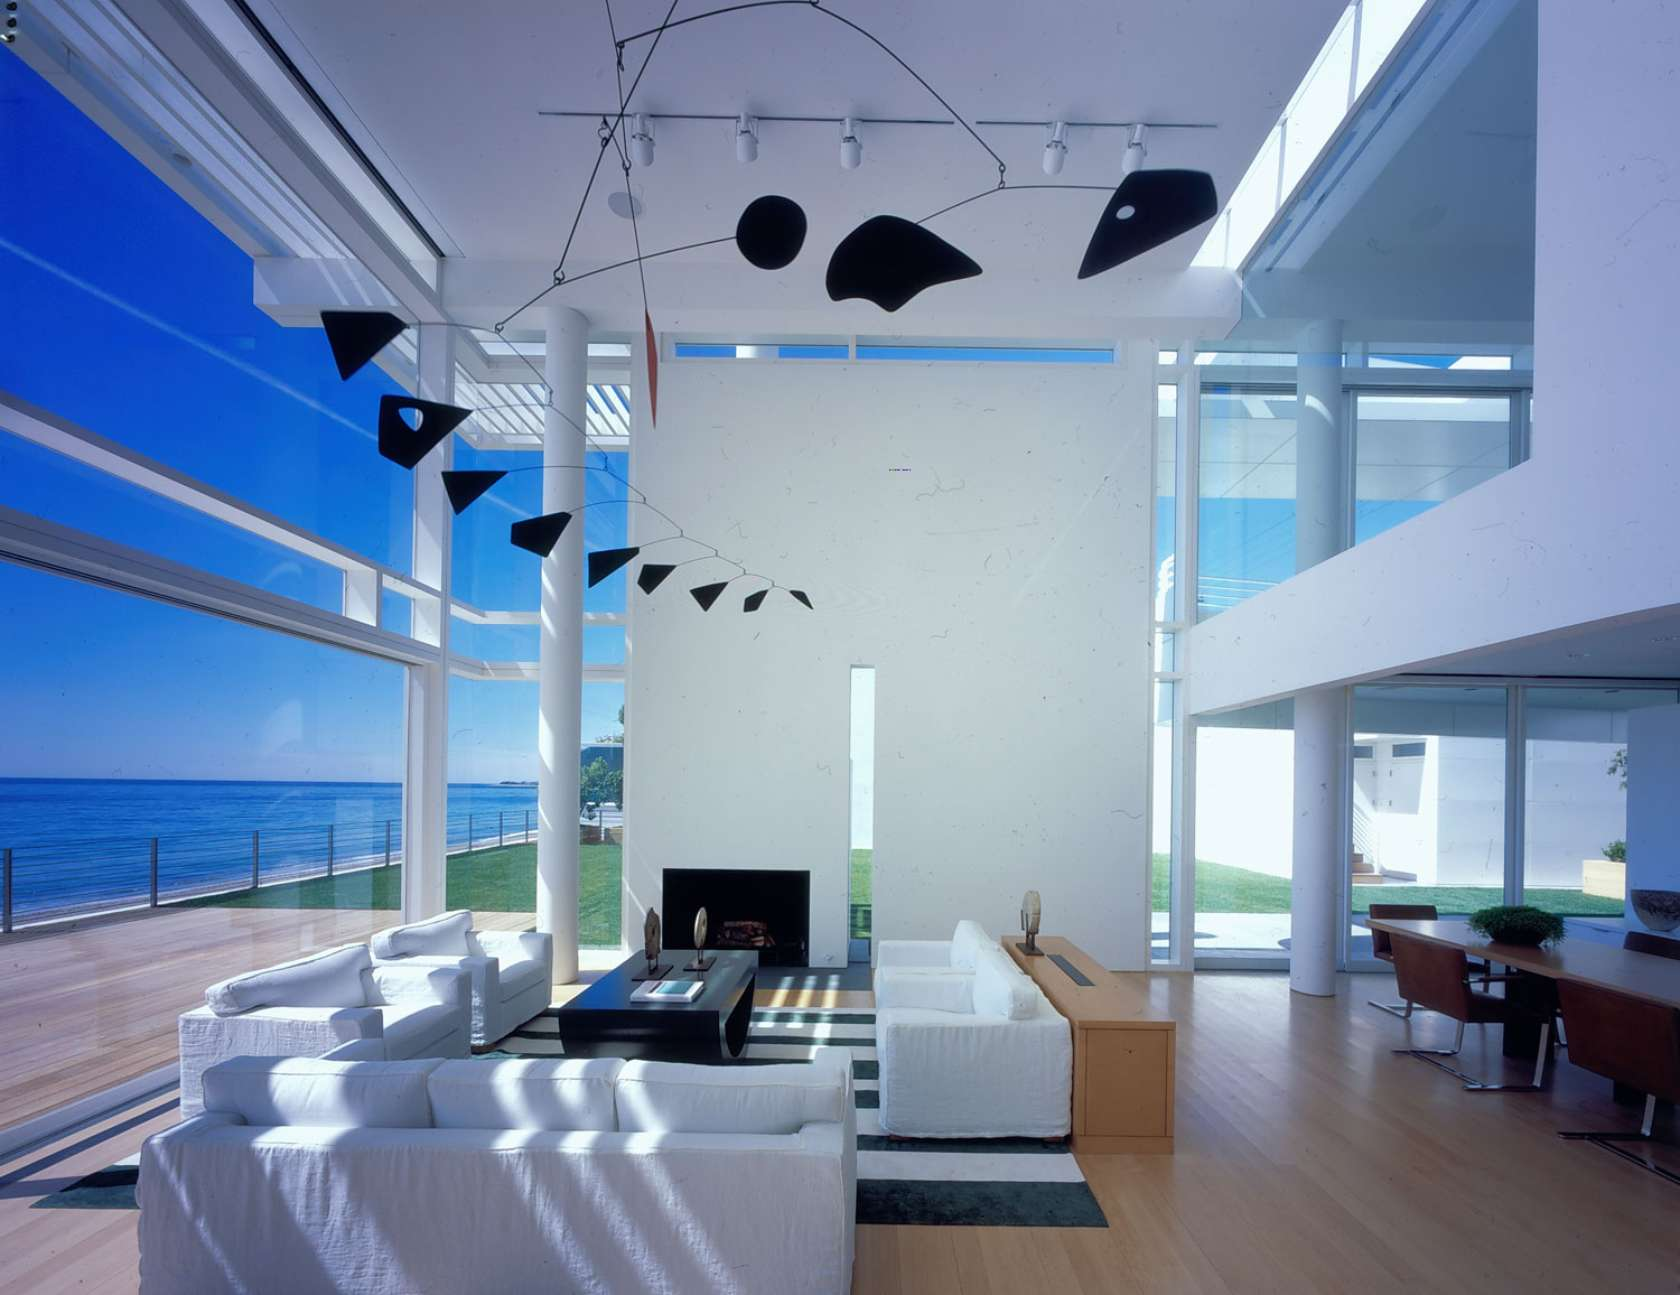 Richard meier partners architects architizer - Beach house modern interior design ...